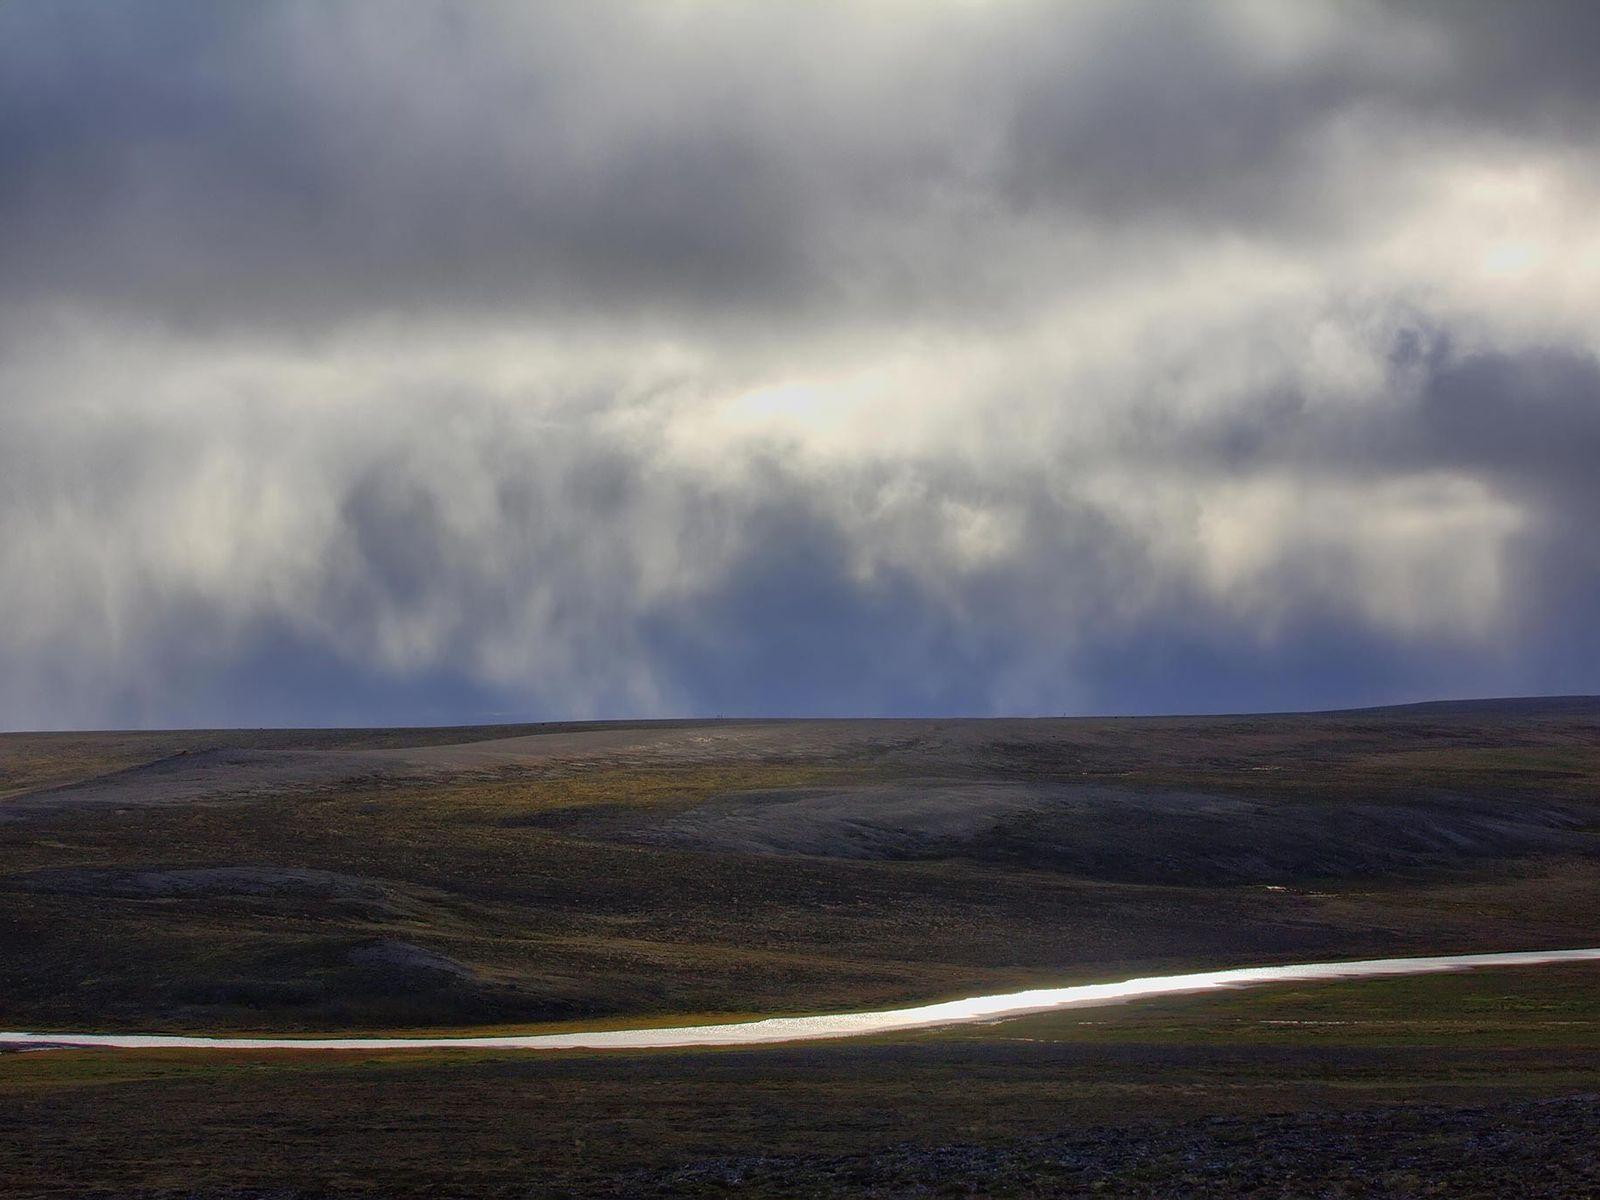 Water flows across a ridge of the Novaya Zemlya archipelago, one of the nuclear test sites ...